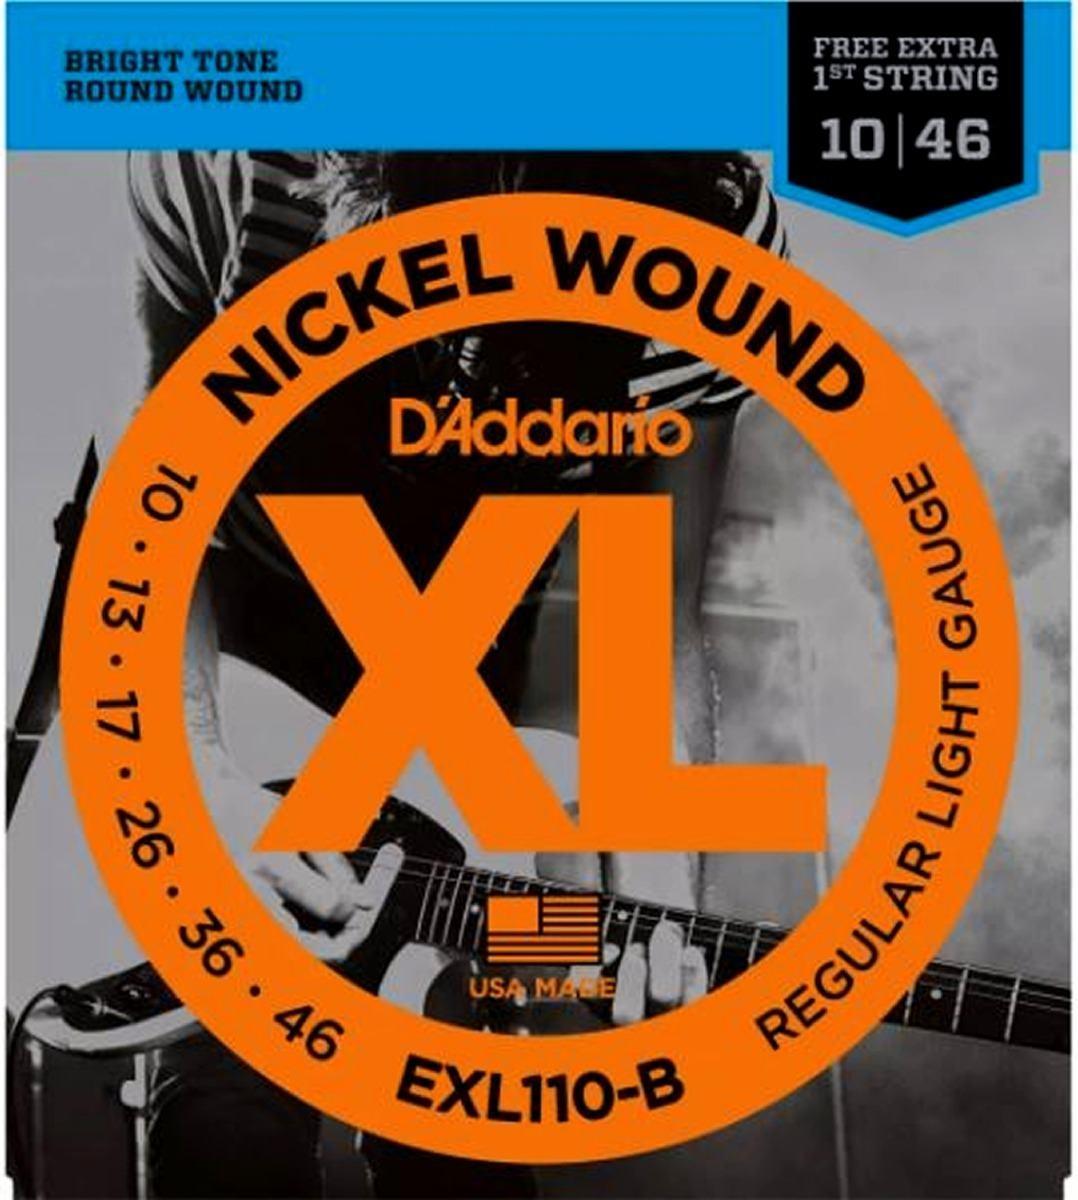 Cordas para Guitarra Encordoamento D'ADDARIO EXL110-B 0.010-0.046